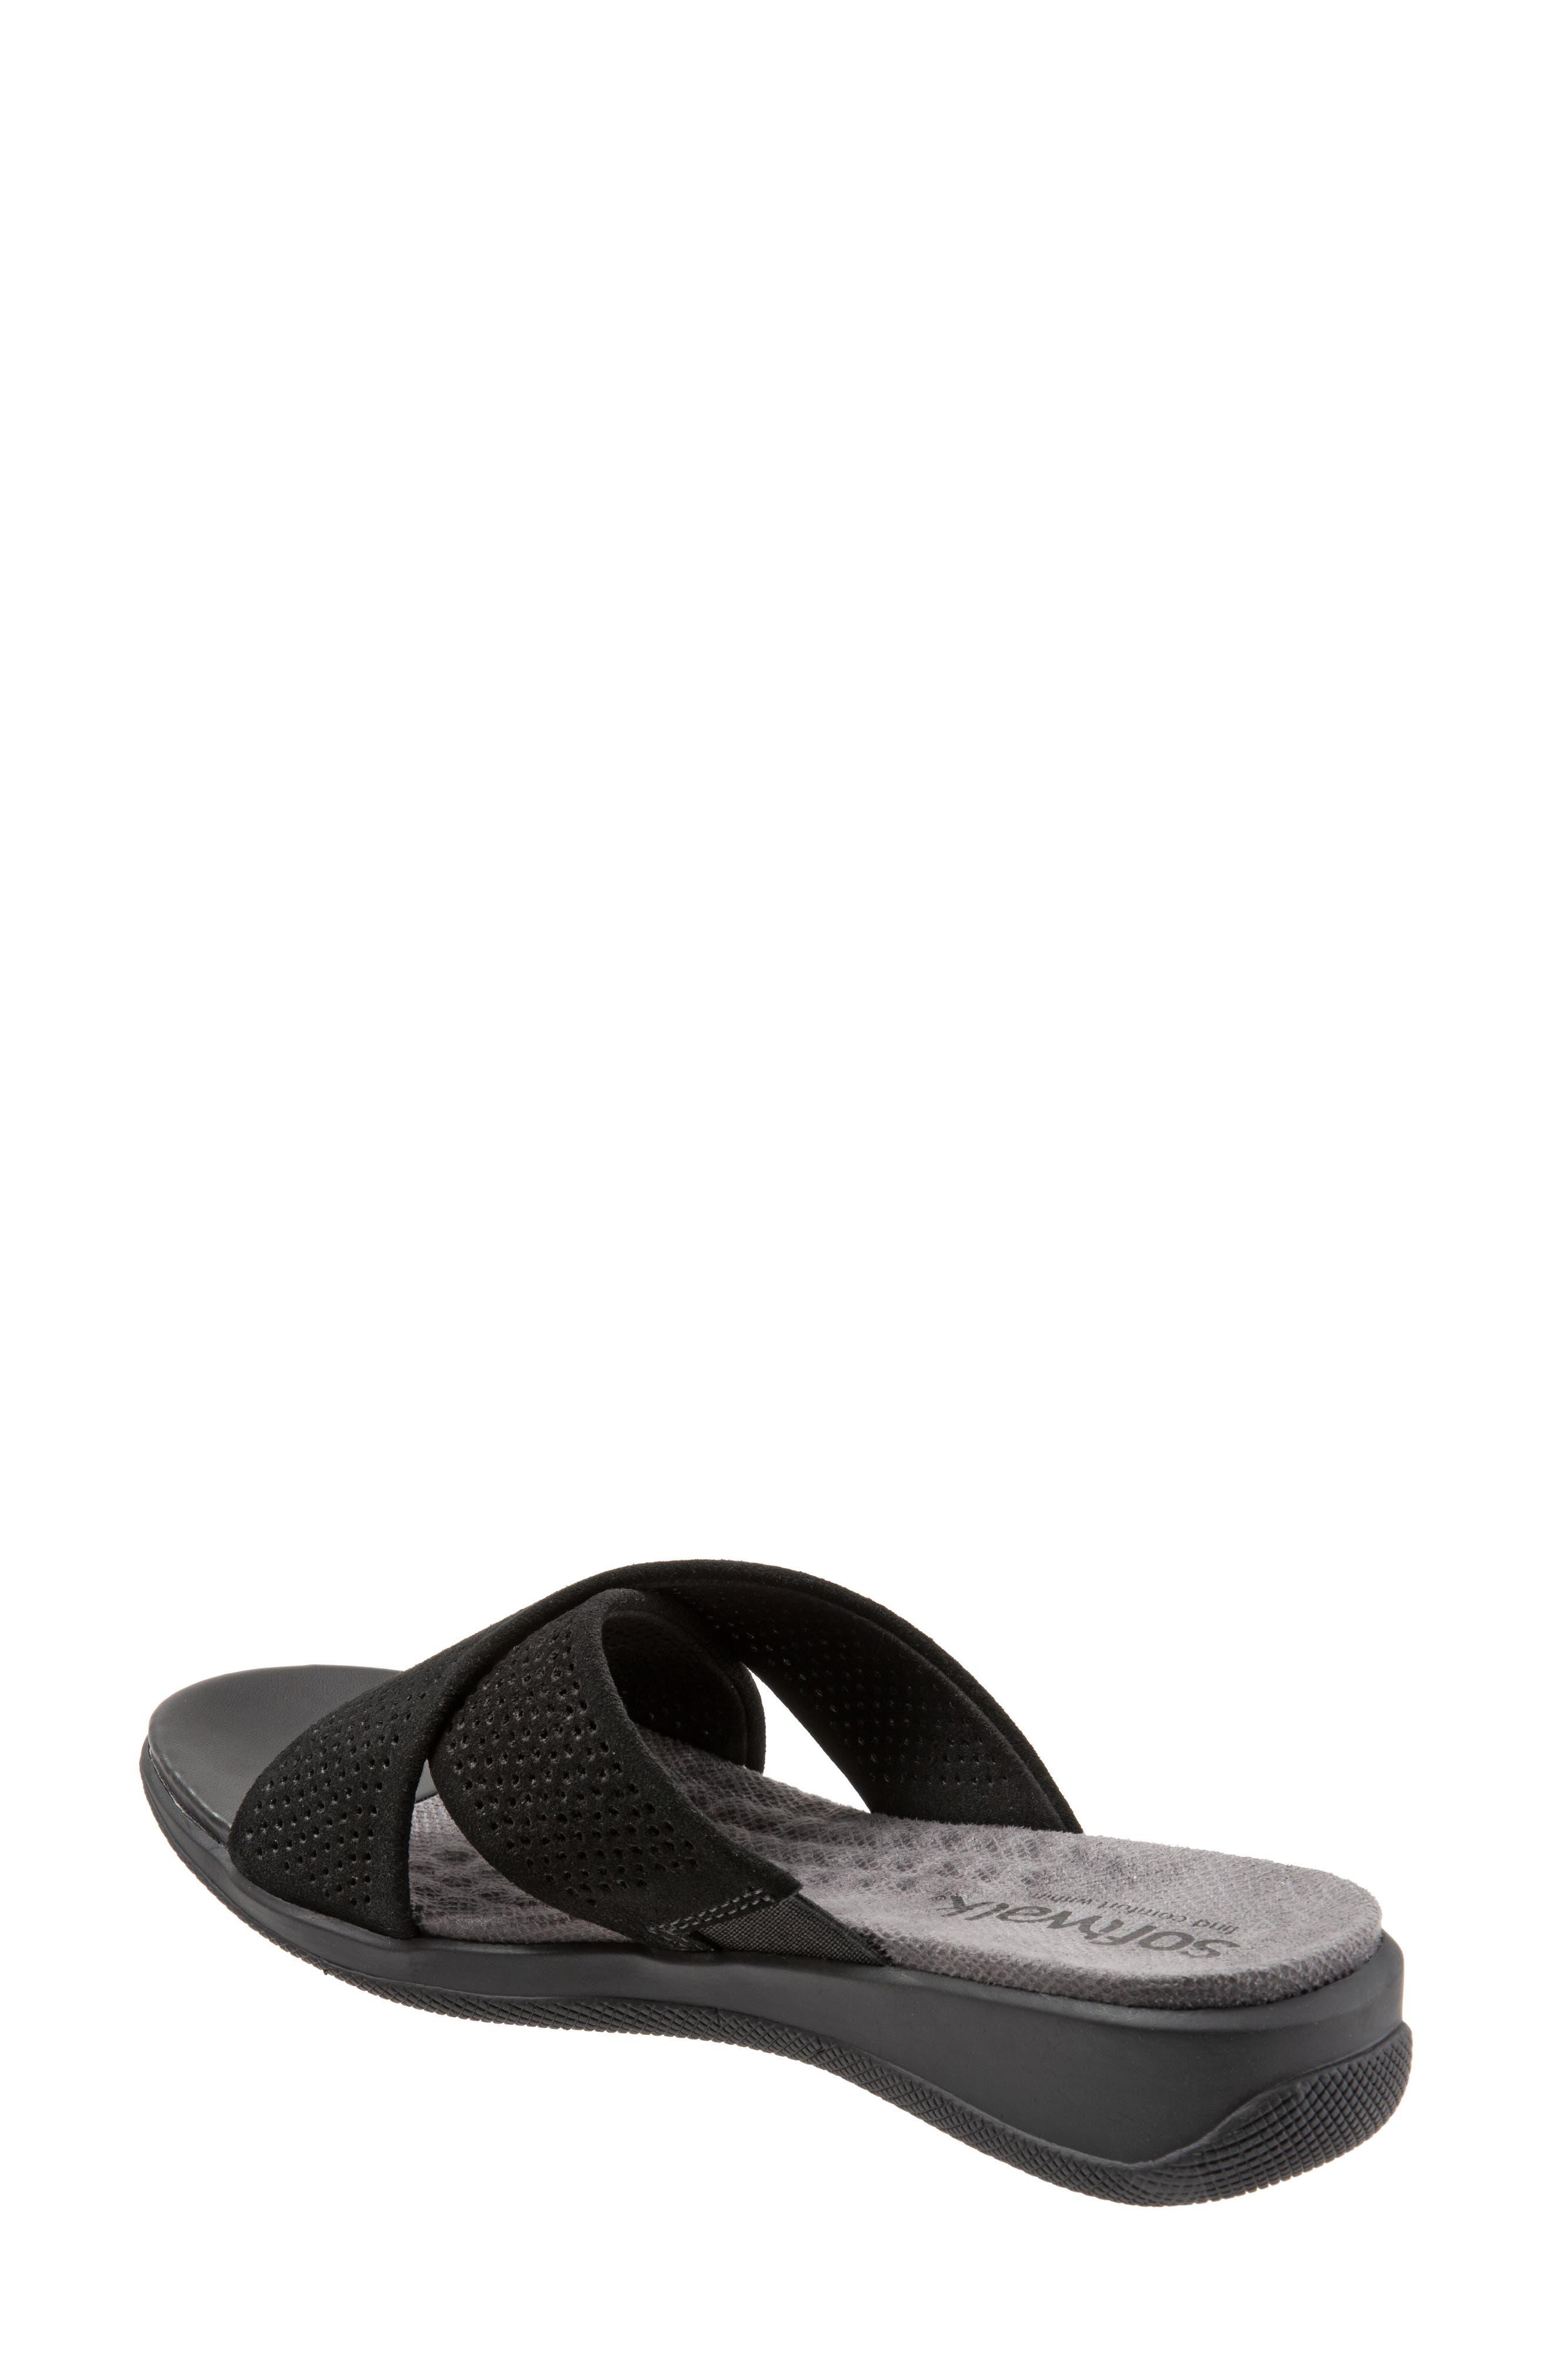 SOFTWALK<SUP>®</SUP>, 'Tillman' Leather Cross Strap Slide Sandal, Alternate thumbnail 2, color, 002